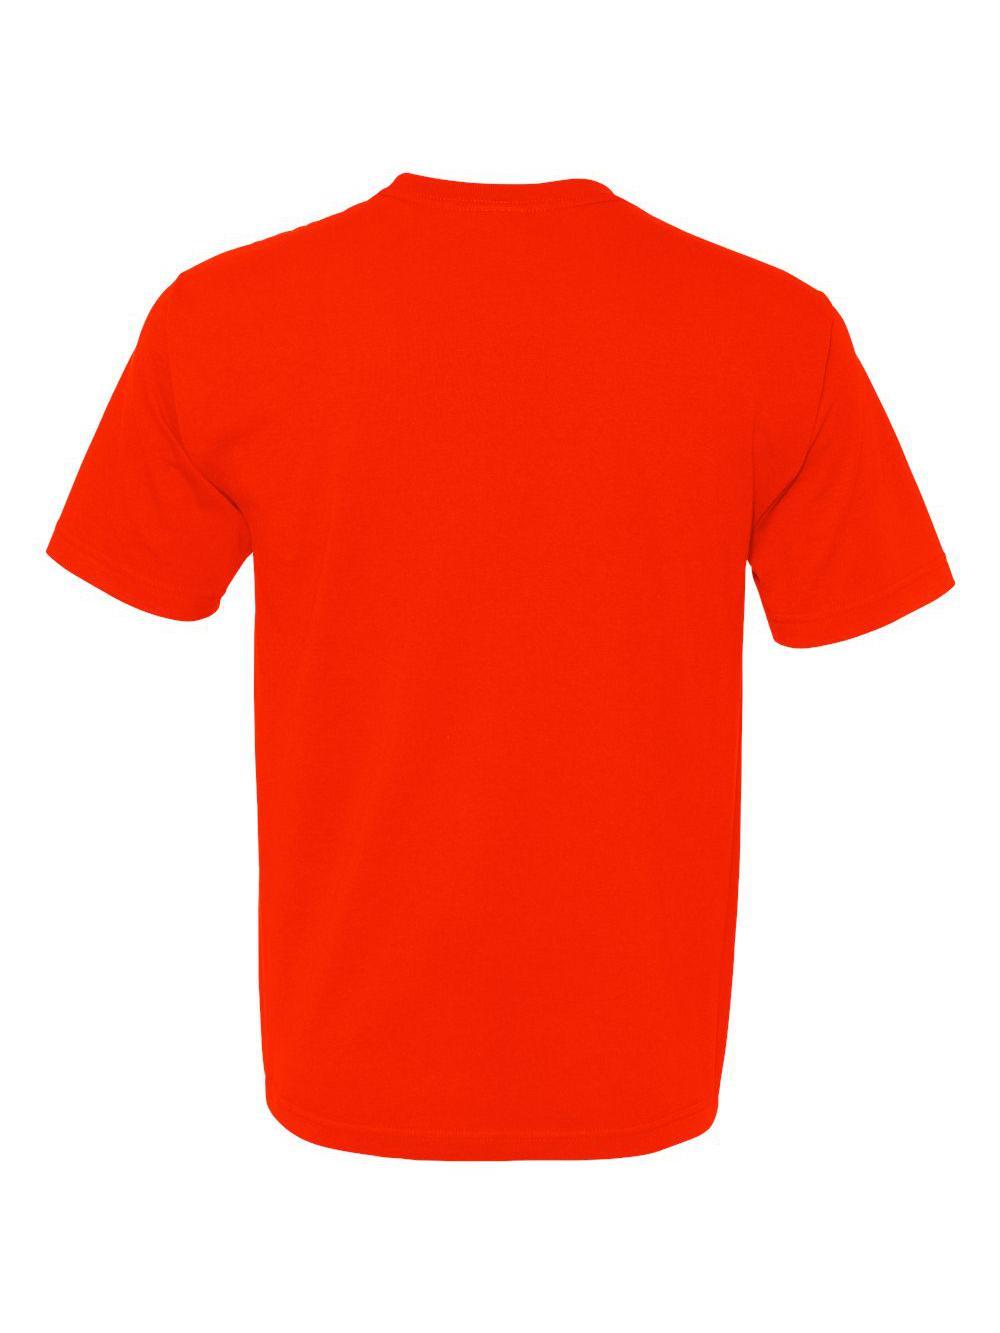 Bayside-USA-Made-100-Cotton-Short-Sleeve-T-Shirt-5040 thumbnail 7